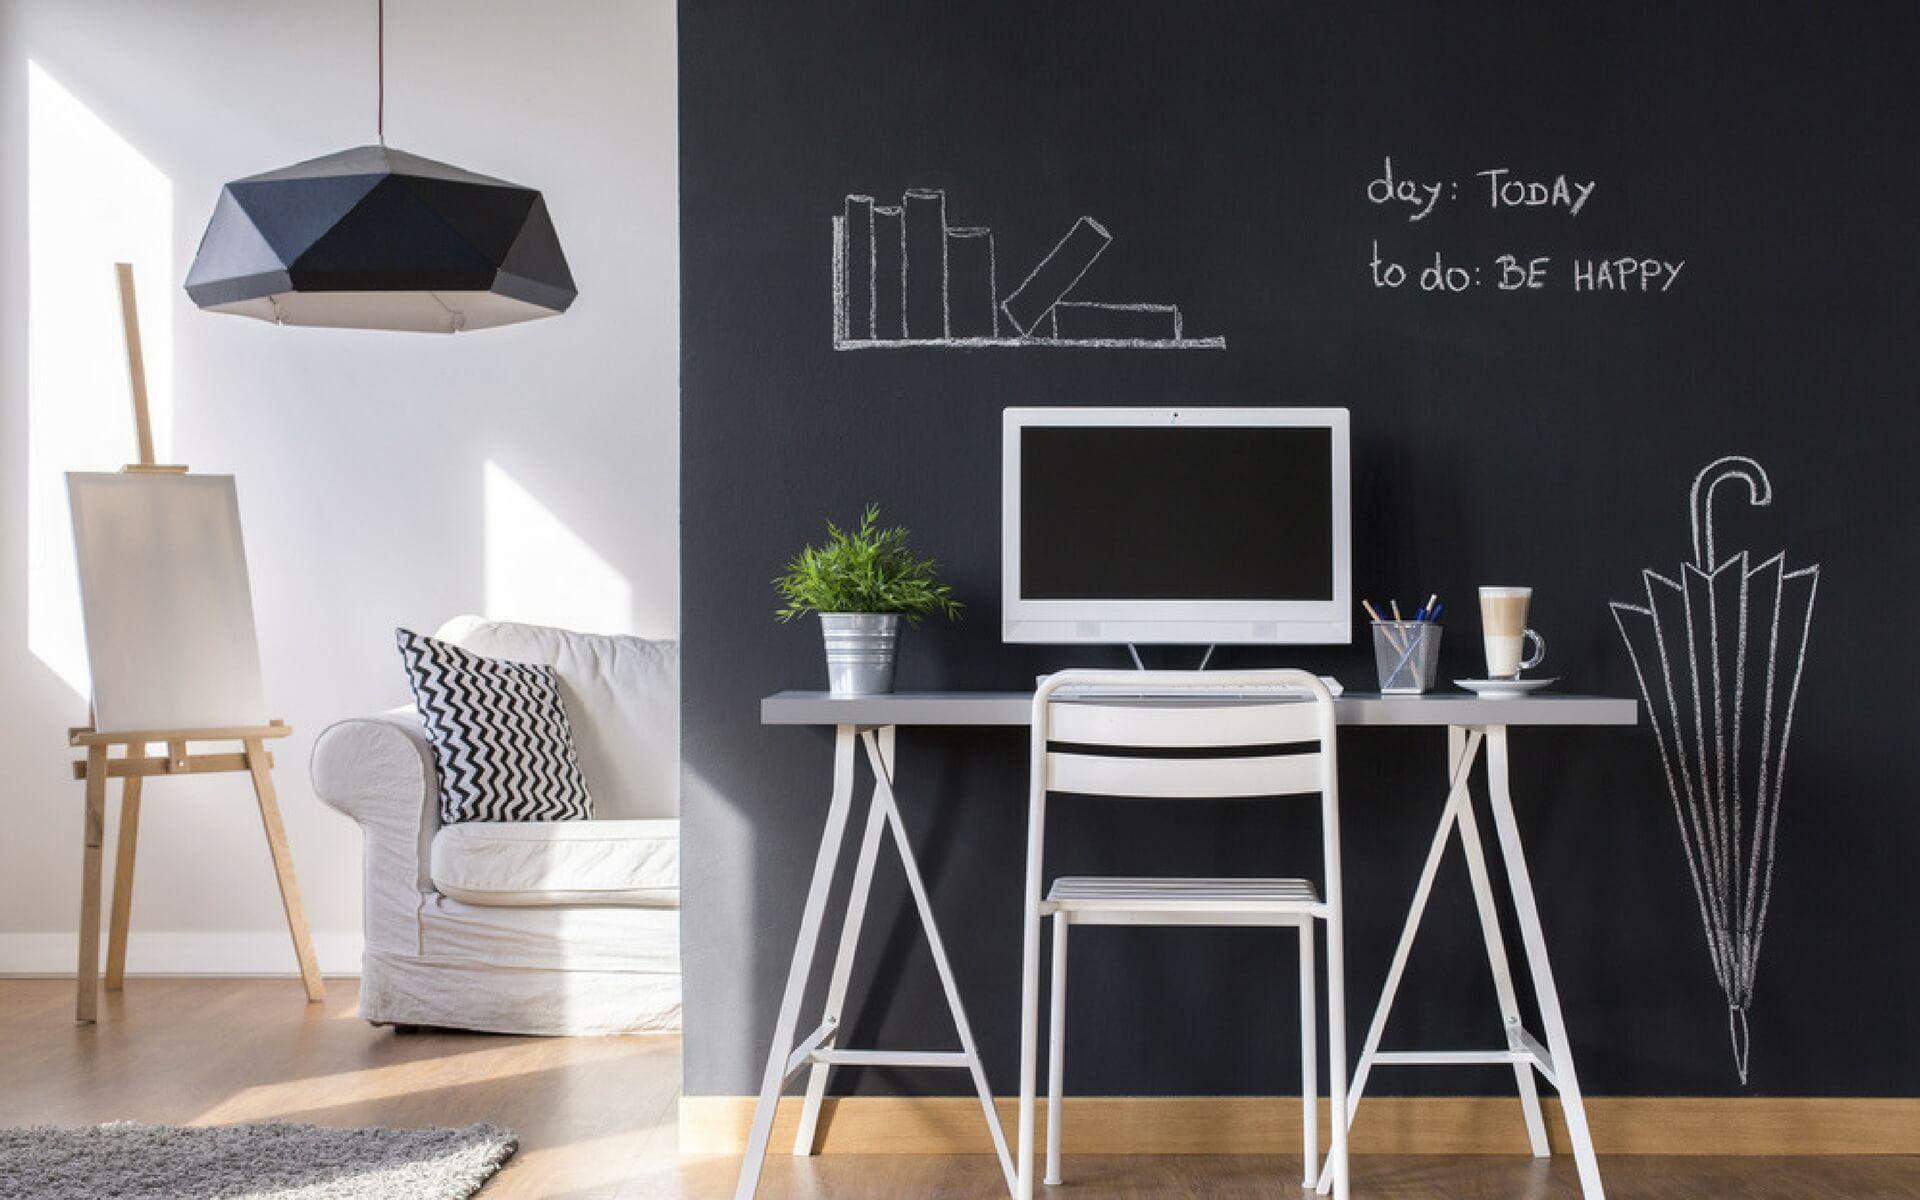 Decorare le pareti con vernice lavagna blog oknoplast - Vernice per pareti ...